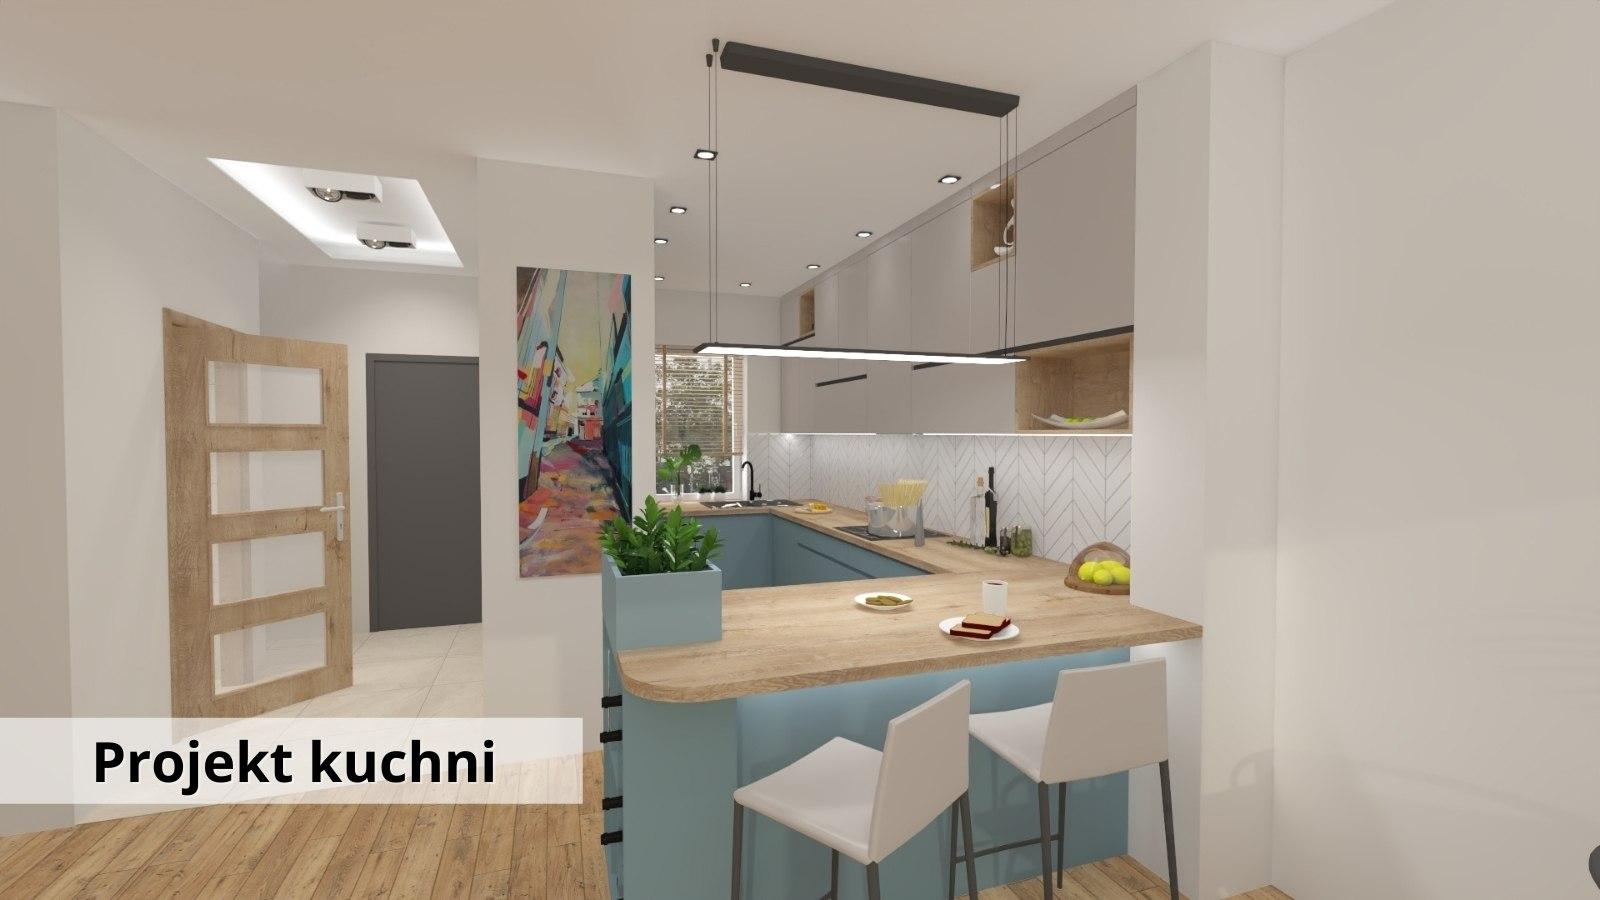 Nowoczesny projekt kuchni